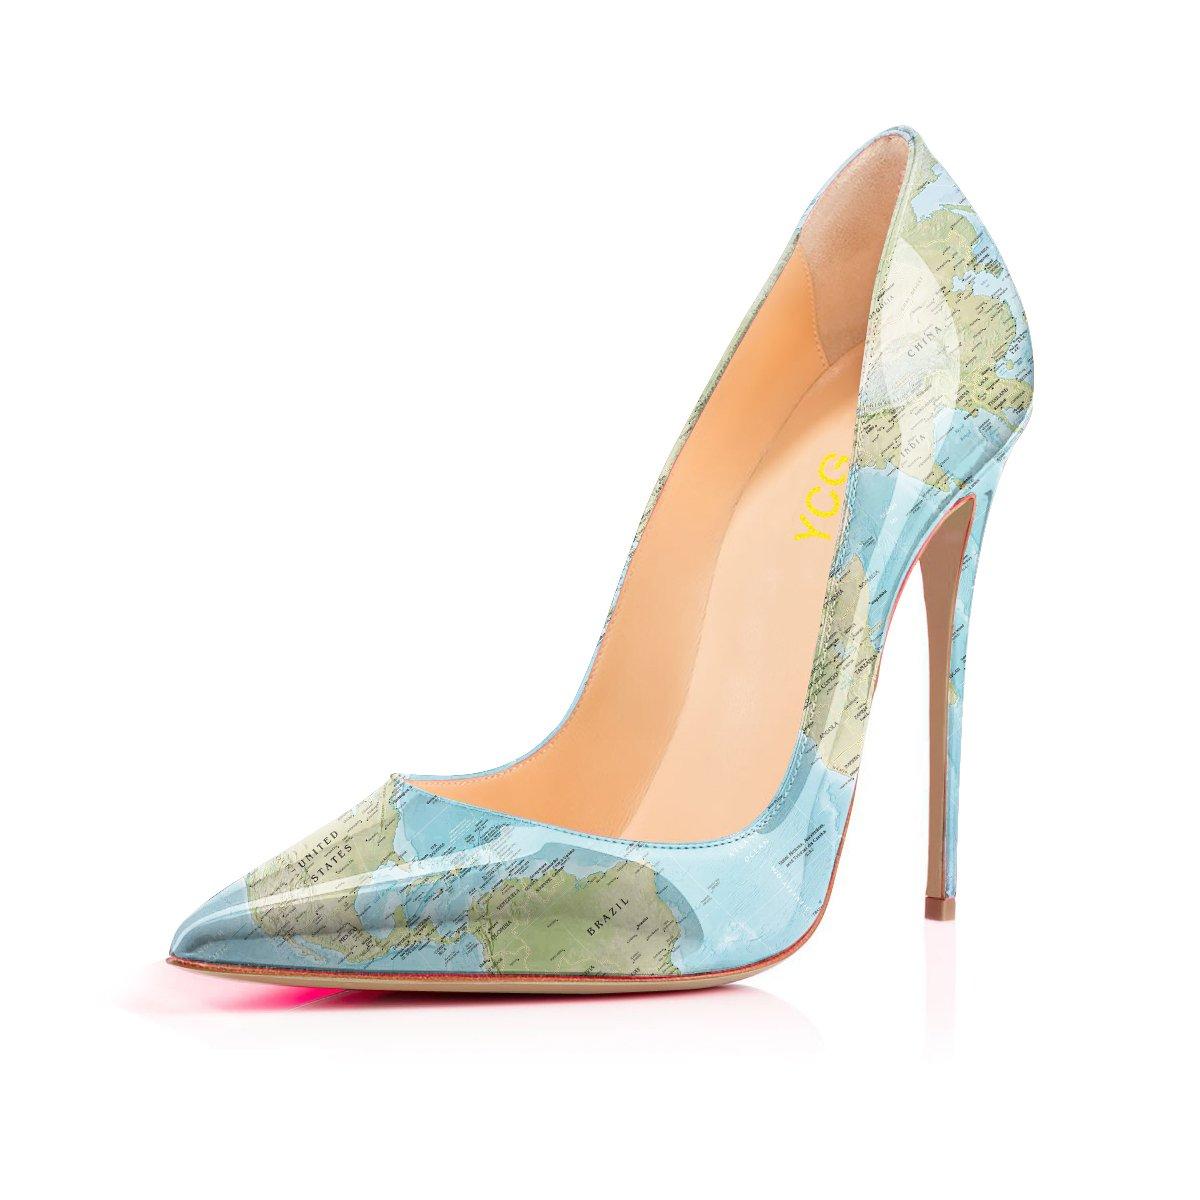 YCG Women's High Heels Pumps Red Blood Printing Slip on Shoes B07DJ9WRJY US5=footlength 22.3cm|Blue World Map 2